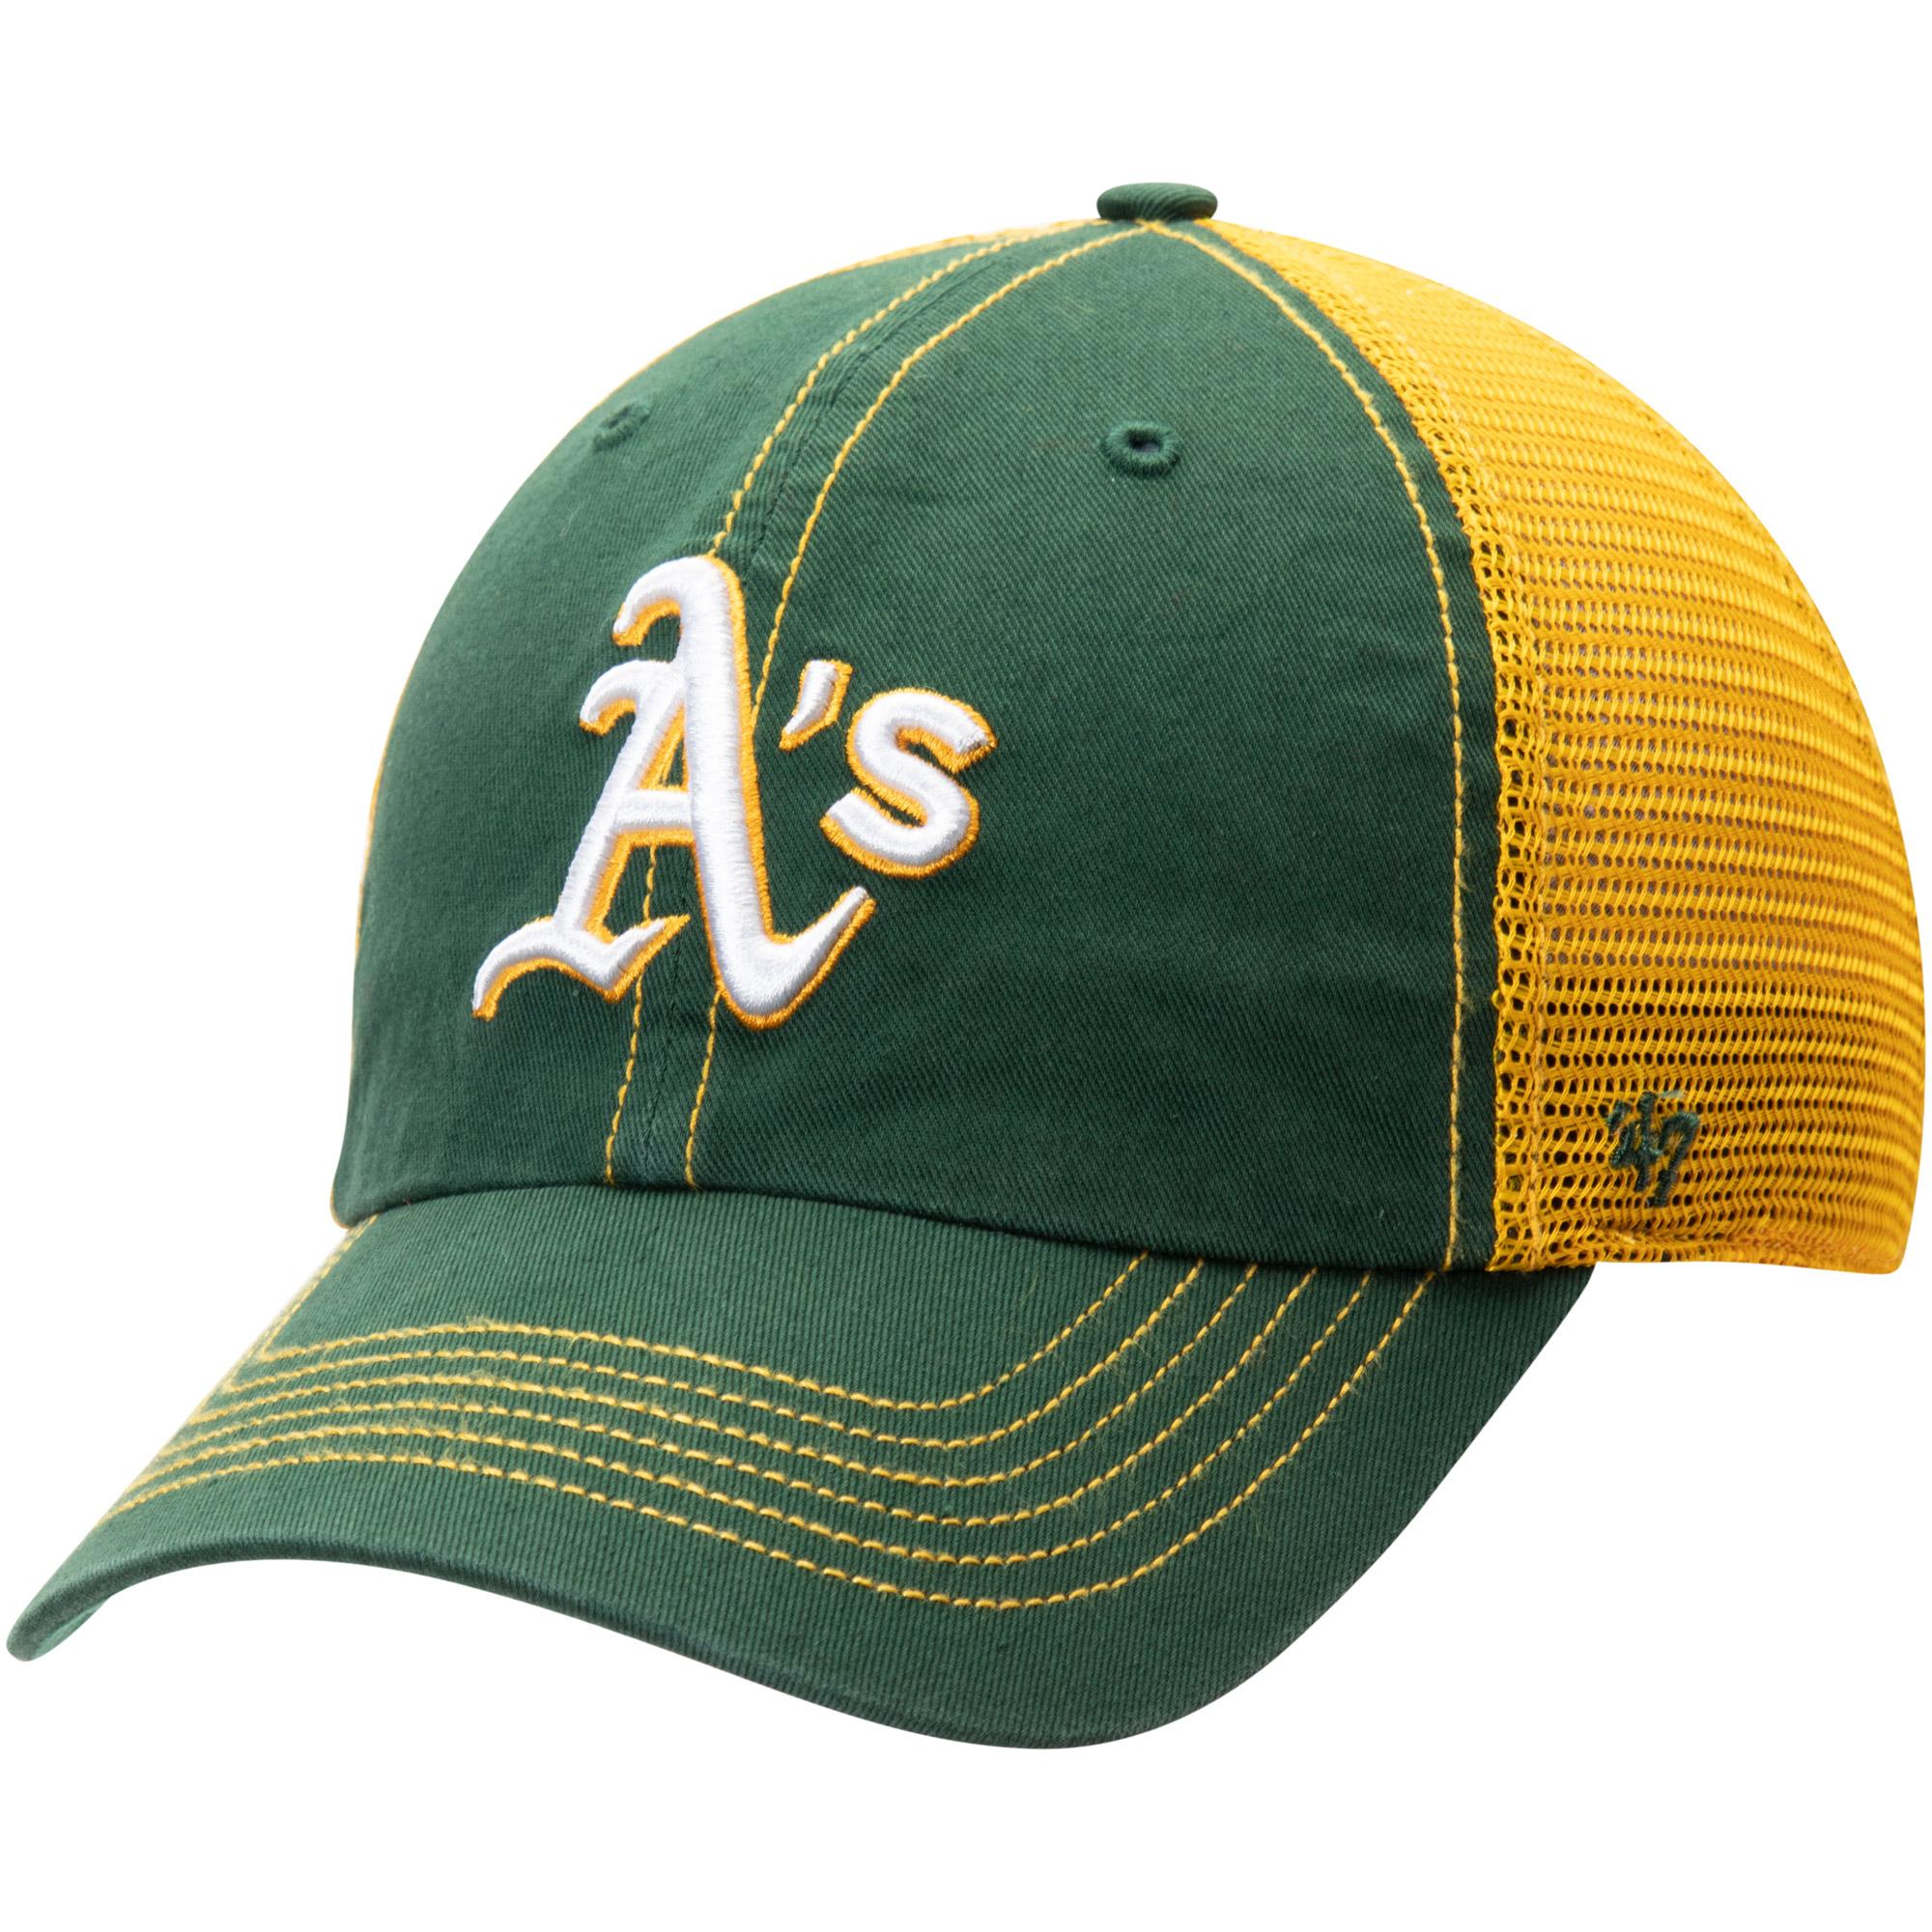 Oakland Athletics '47 Trawler Clean Up Trucker Hat - Green - OSFA